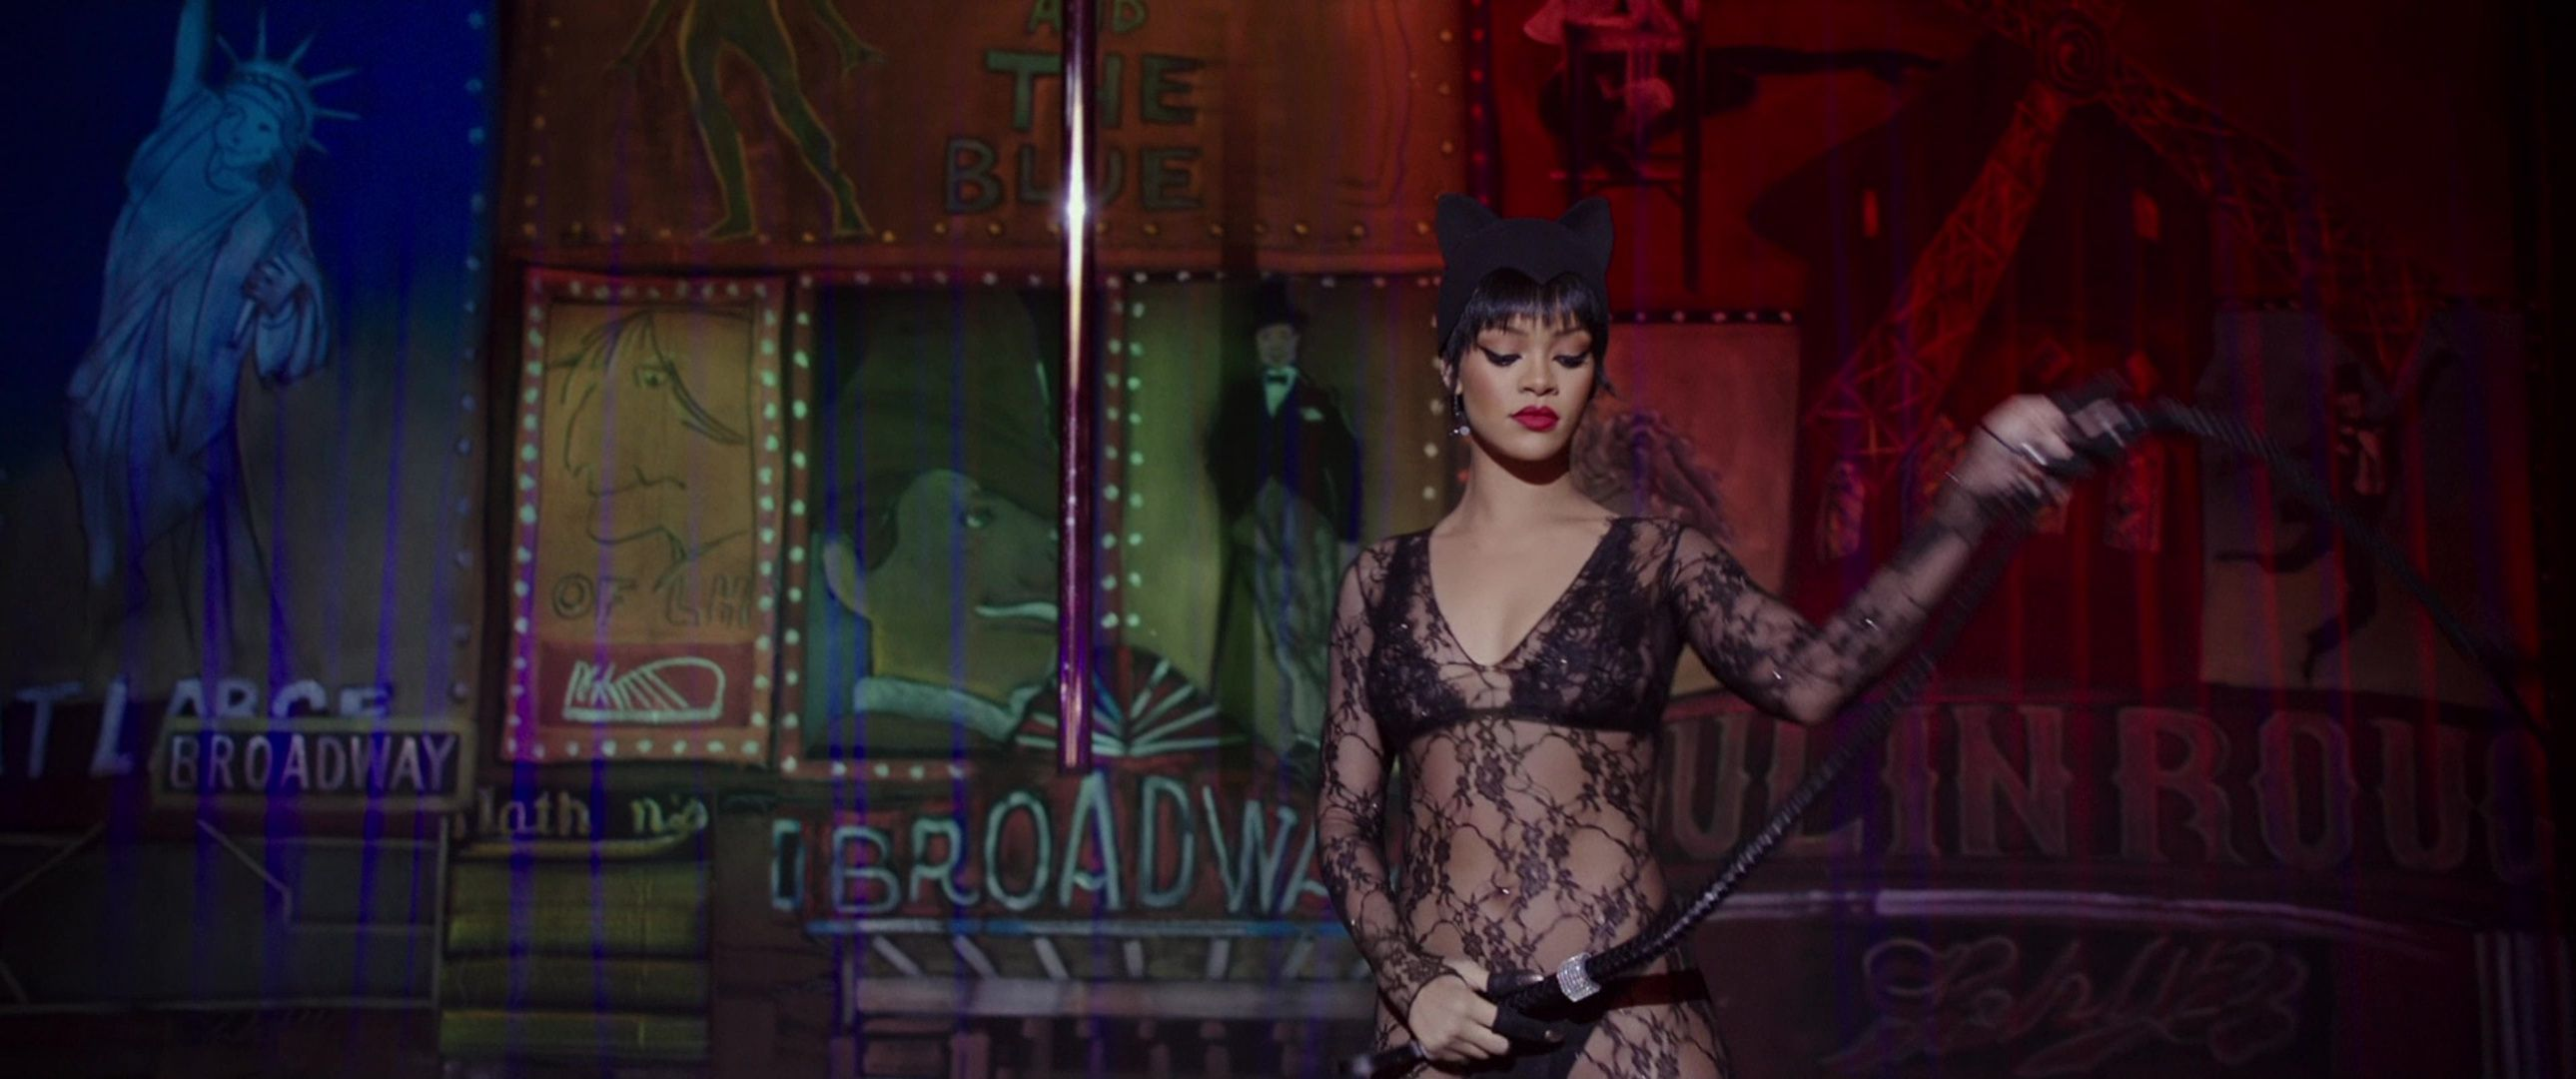 Rihanna-Sexy-40-thefappeningblog.com_.jpg